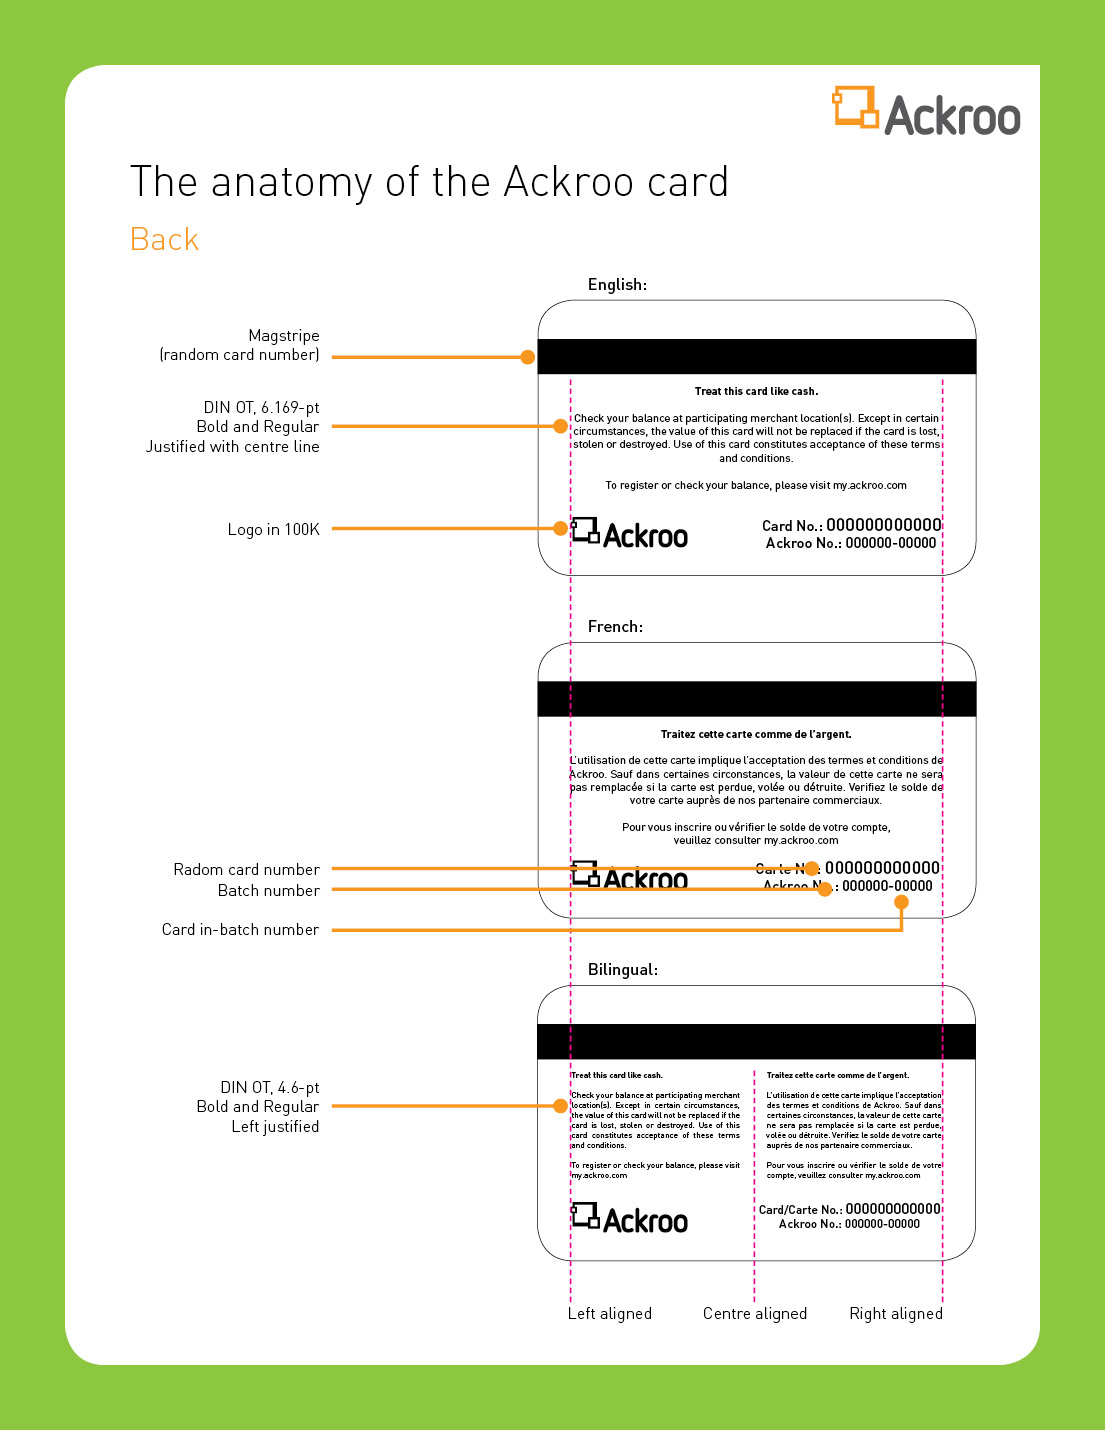 Ackroo Card Anatomy2.jpg